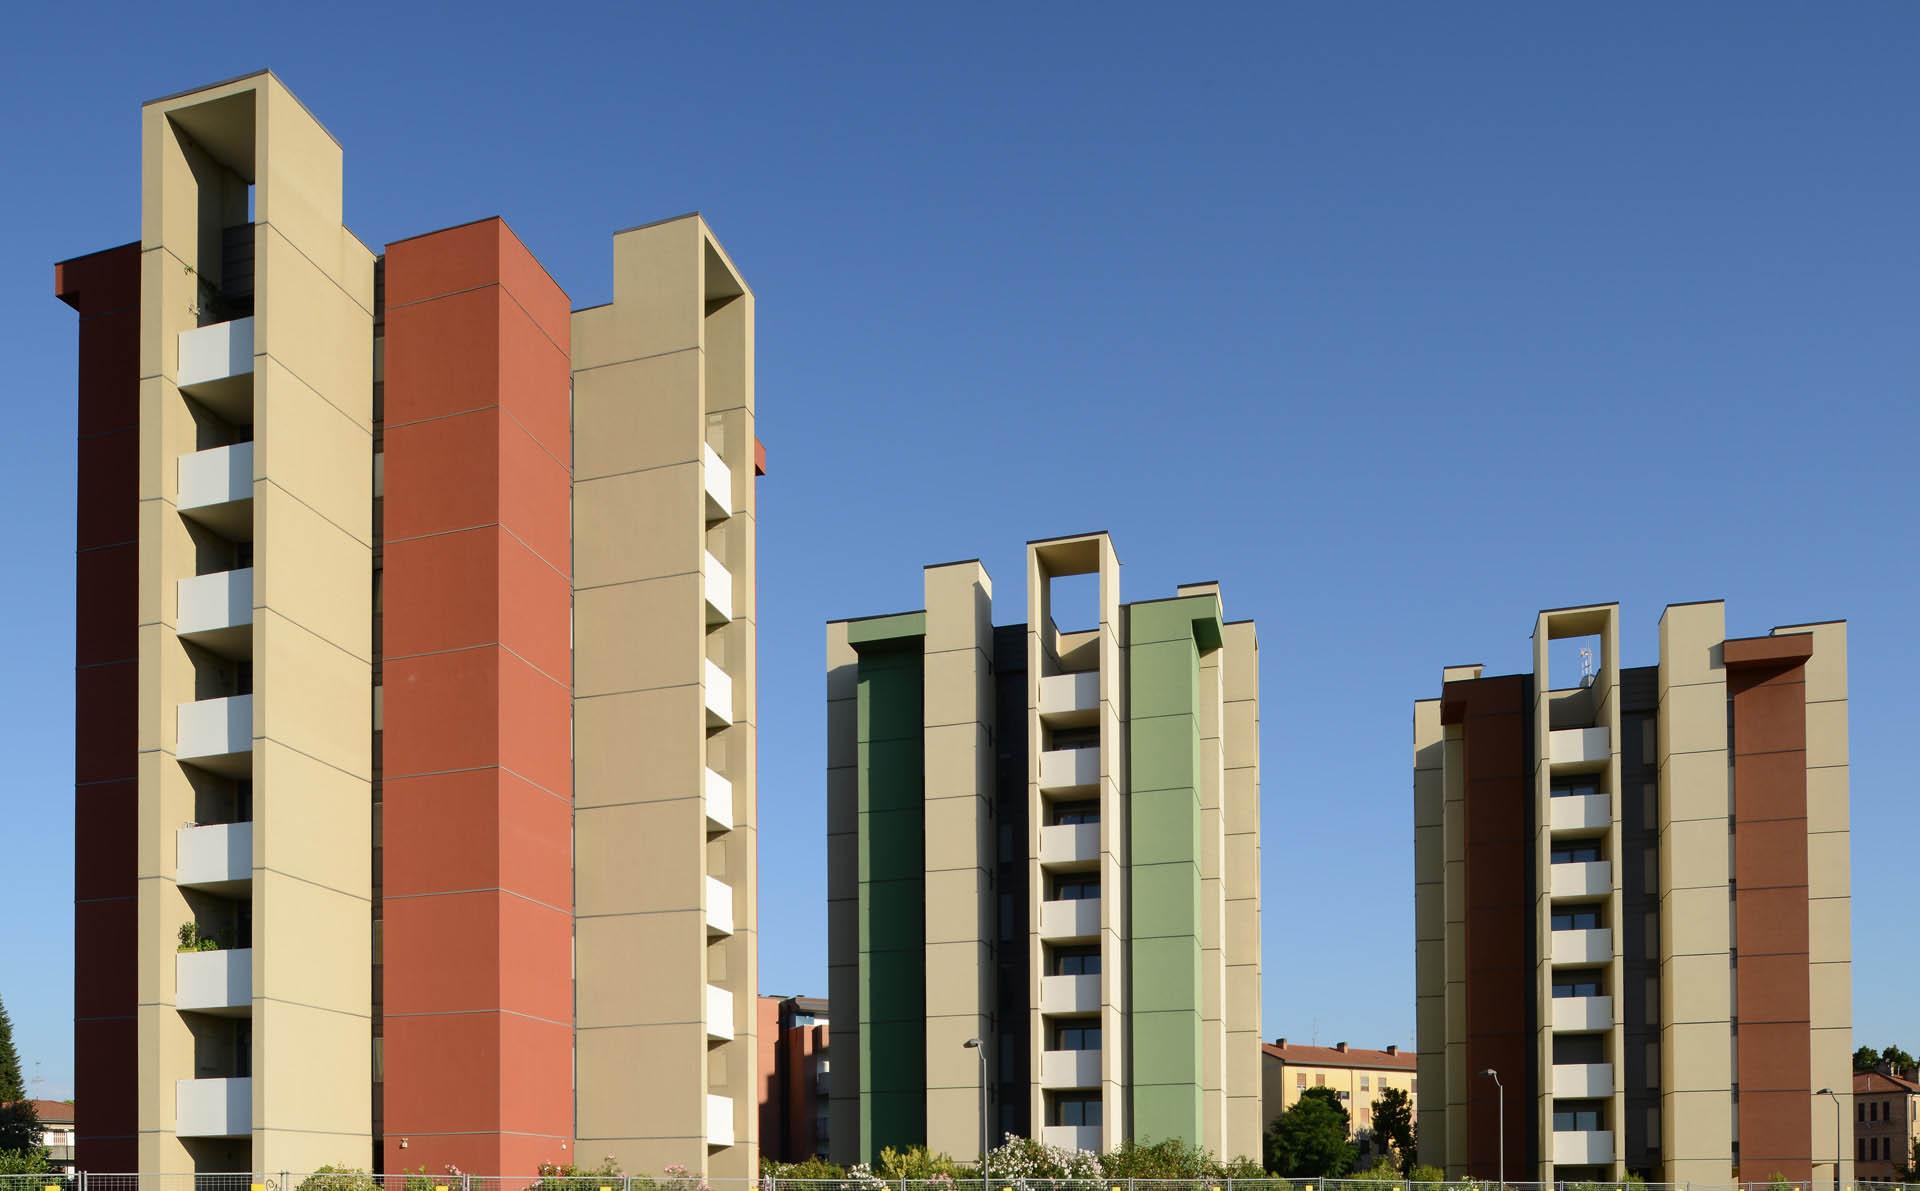 03 Studio Bacchi architetti associati 3 torri img 03